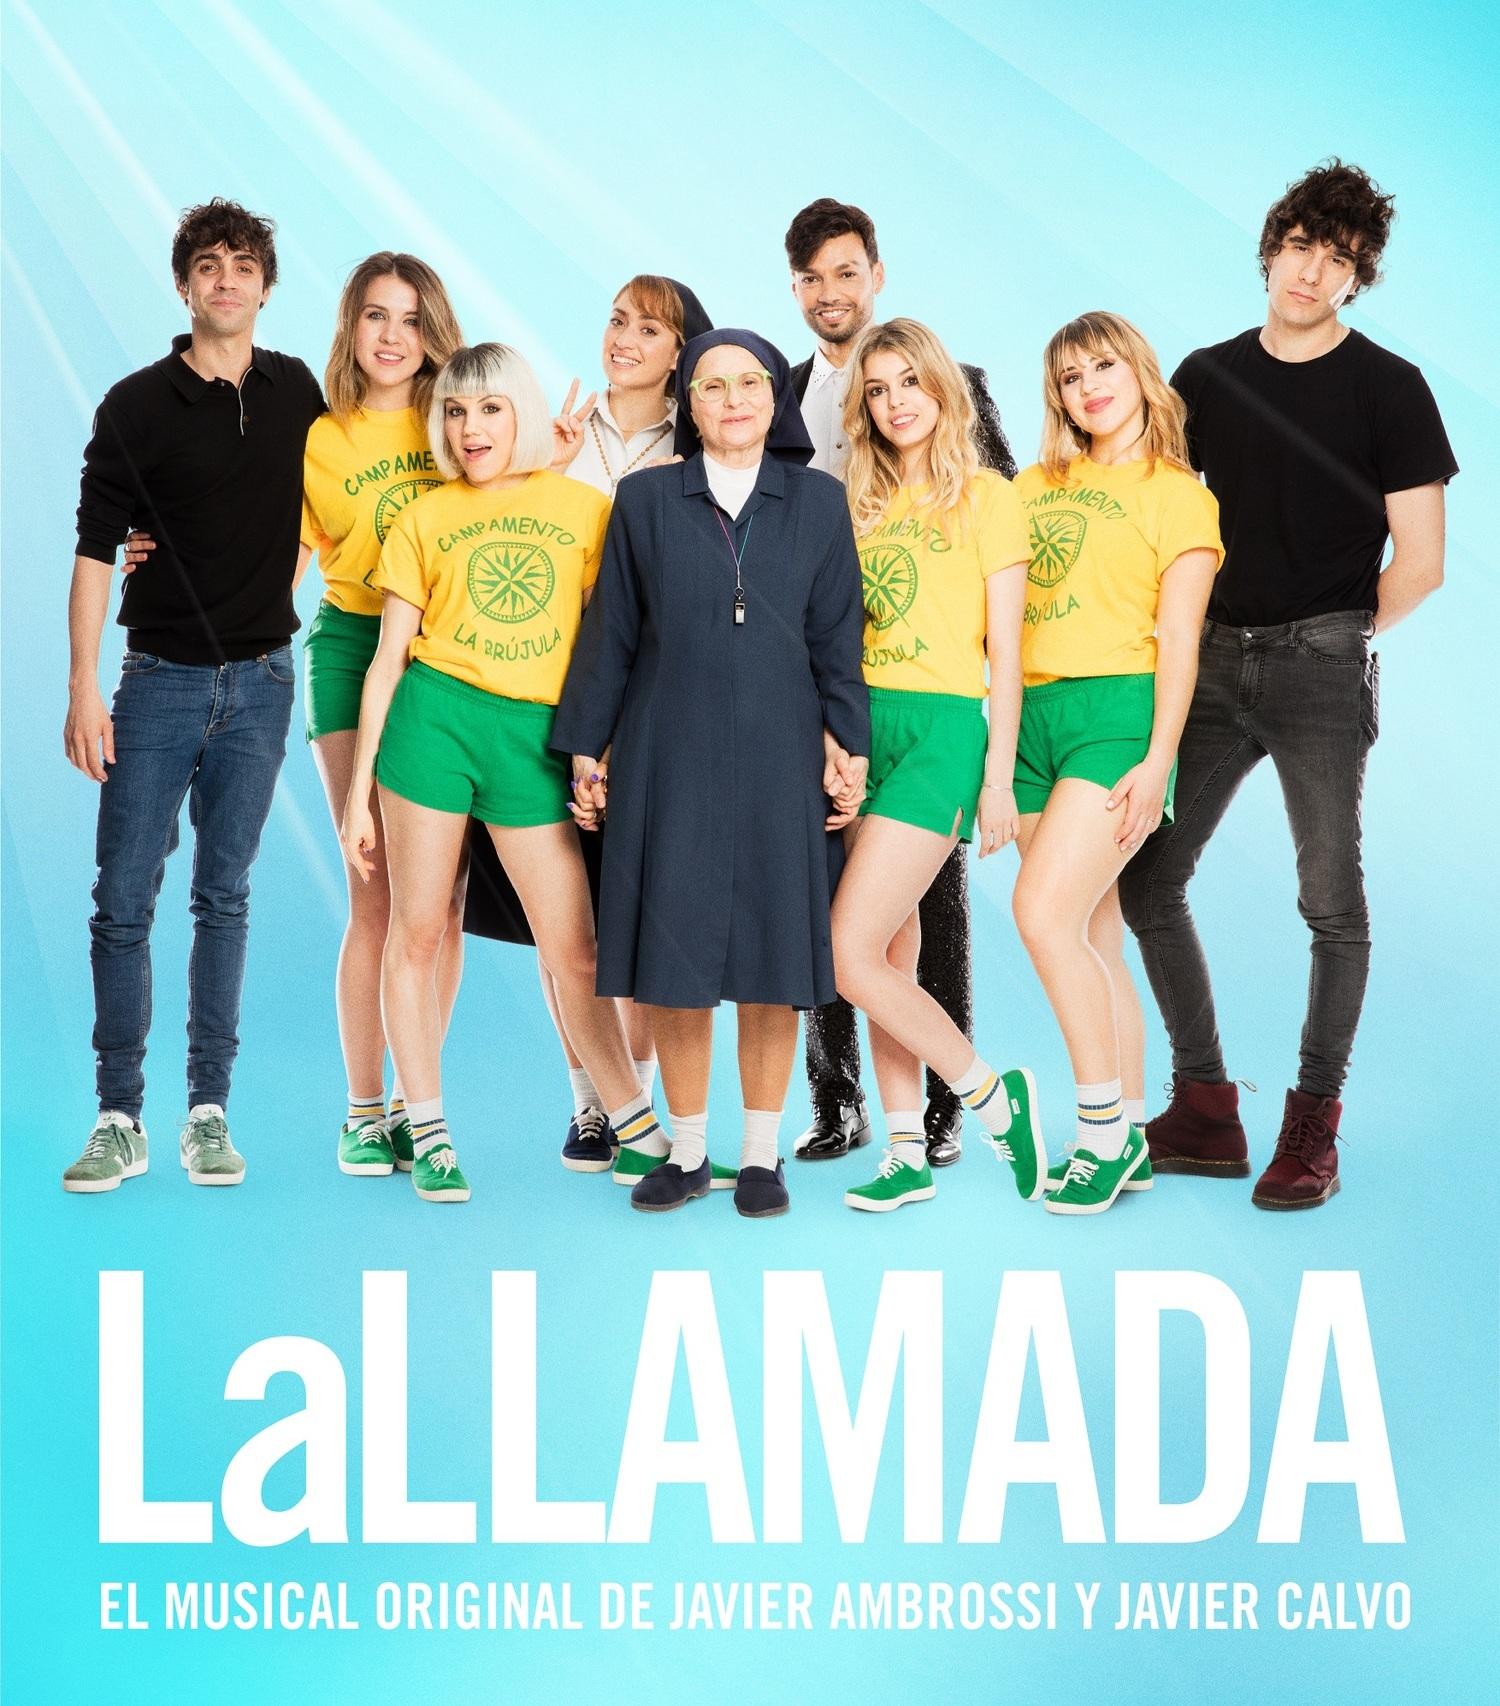 Nerea Rodríguez, de OT 2017, protagonizará LA LLAMADA en Madrid